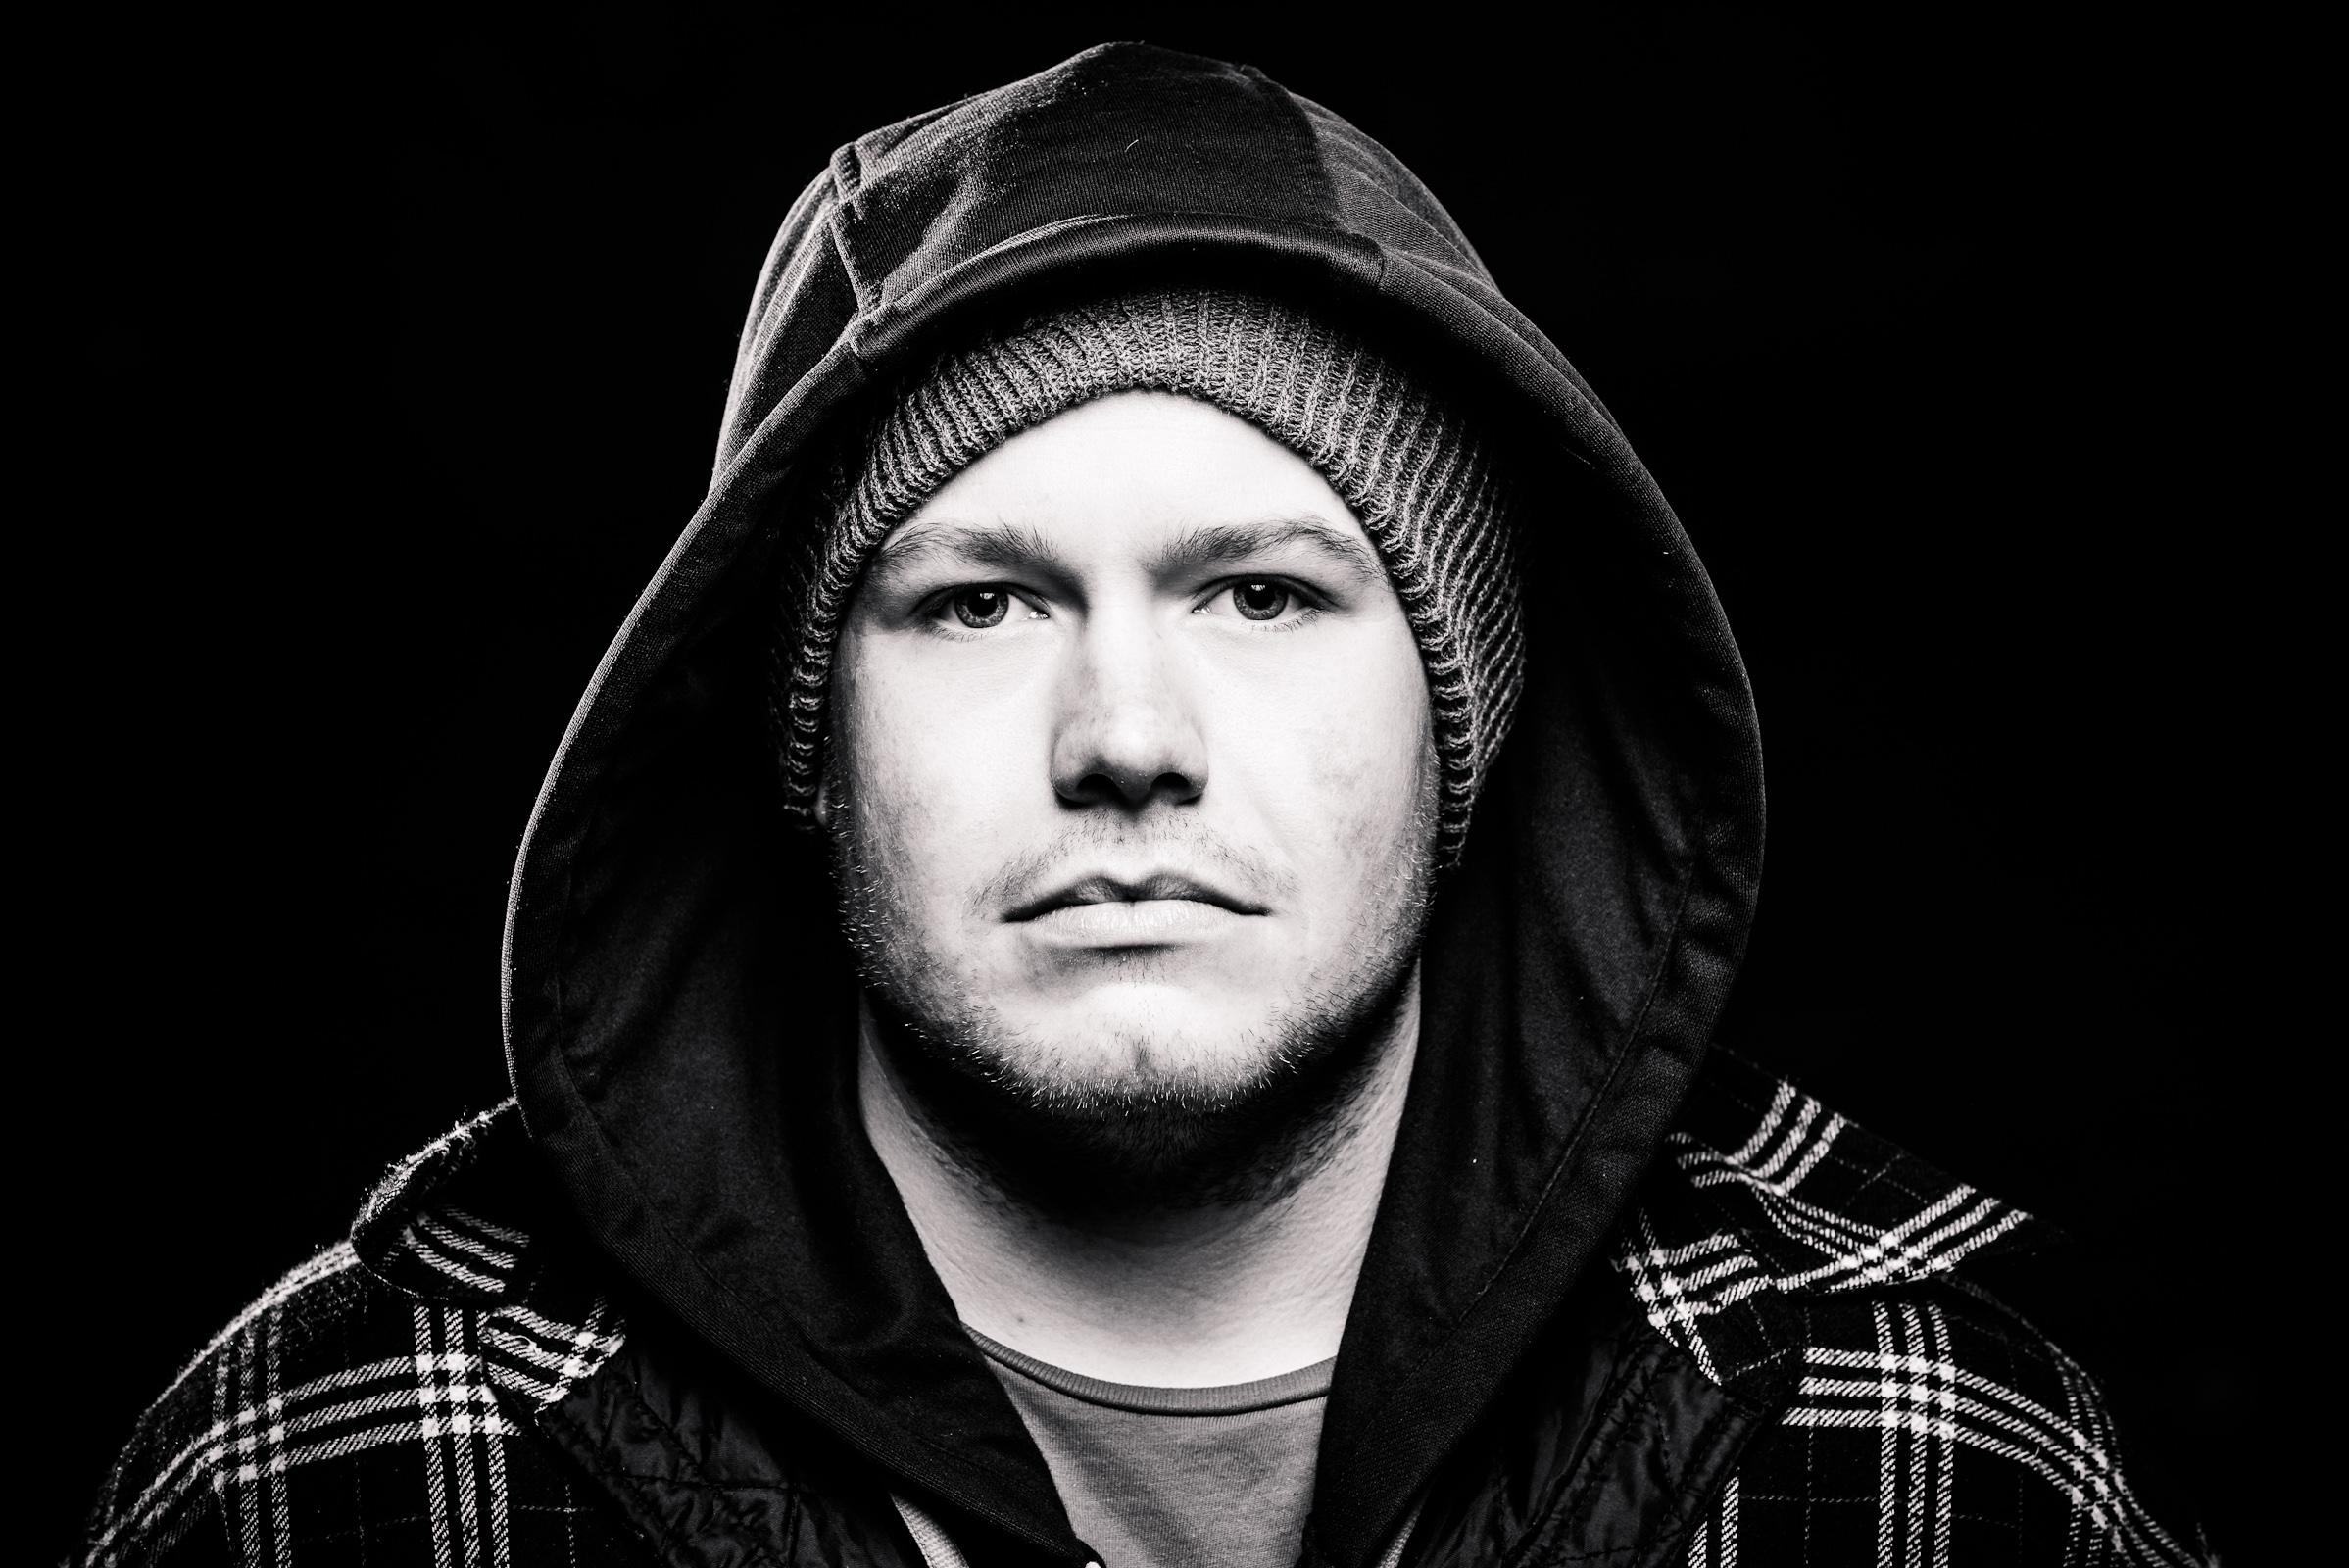 Ryan Regehr Headshot by Andrew Strain